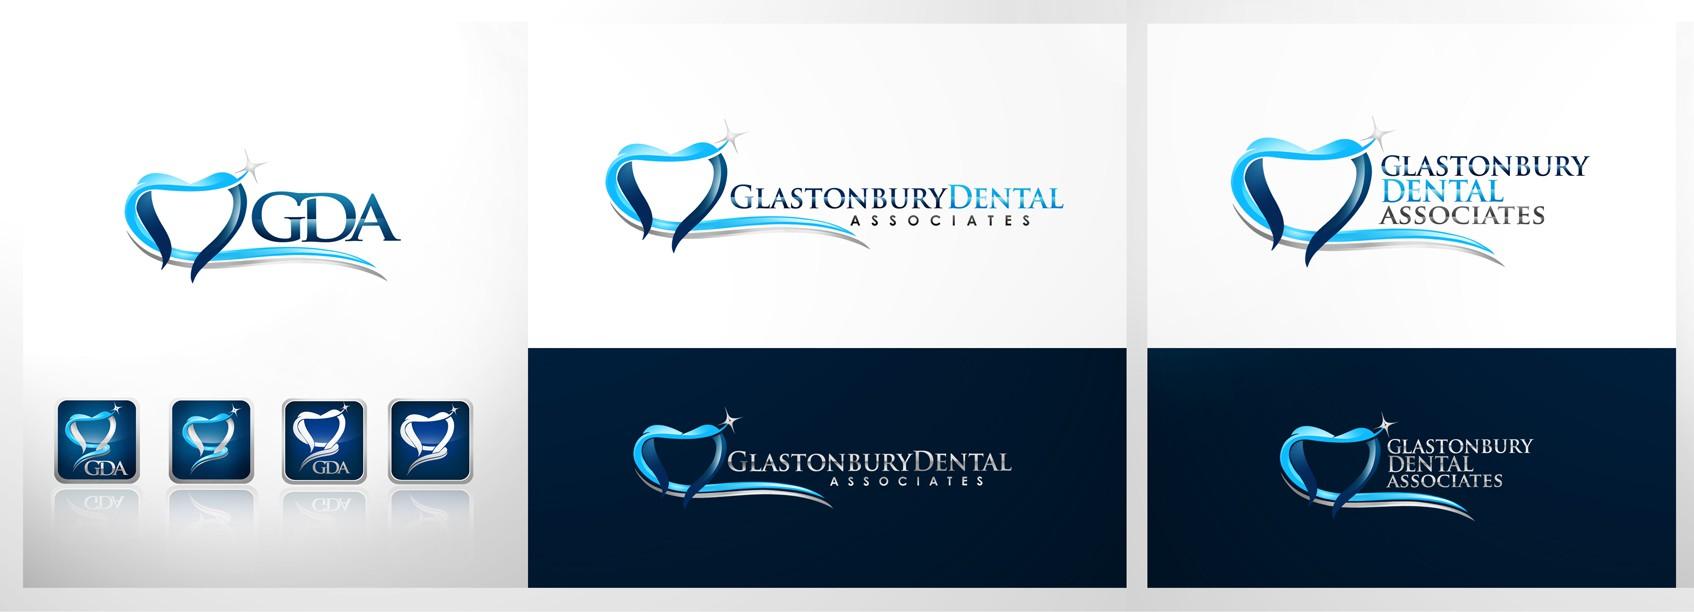 Help Glastonbury Dental Associates create a fresh new logo!